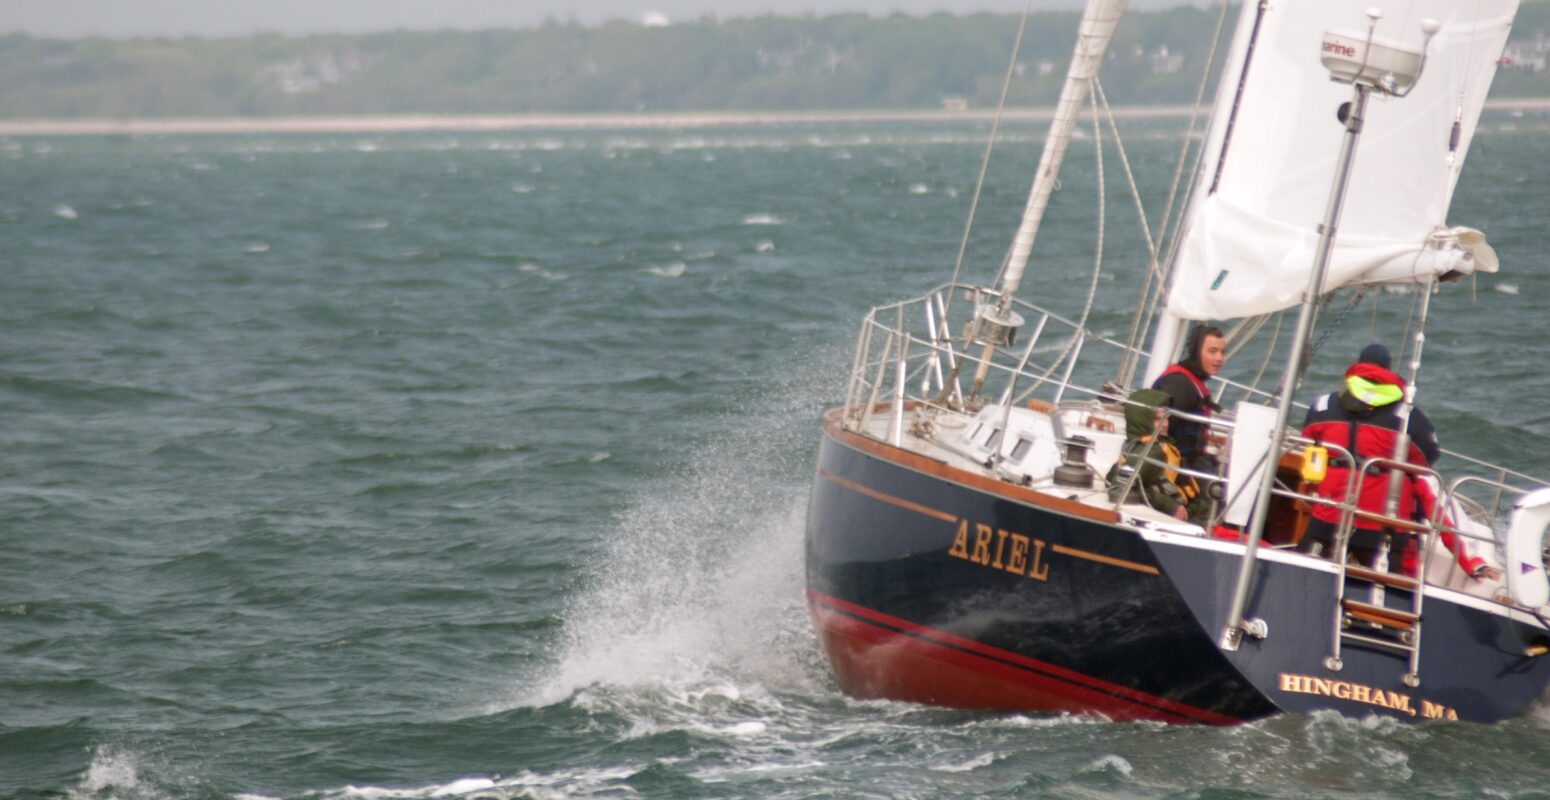 May 29 Figawi Race: Photo Cruise